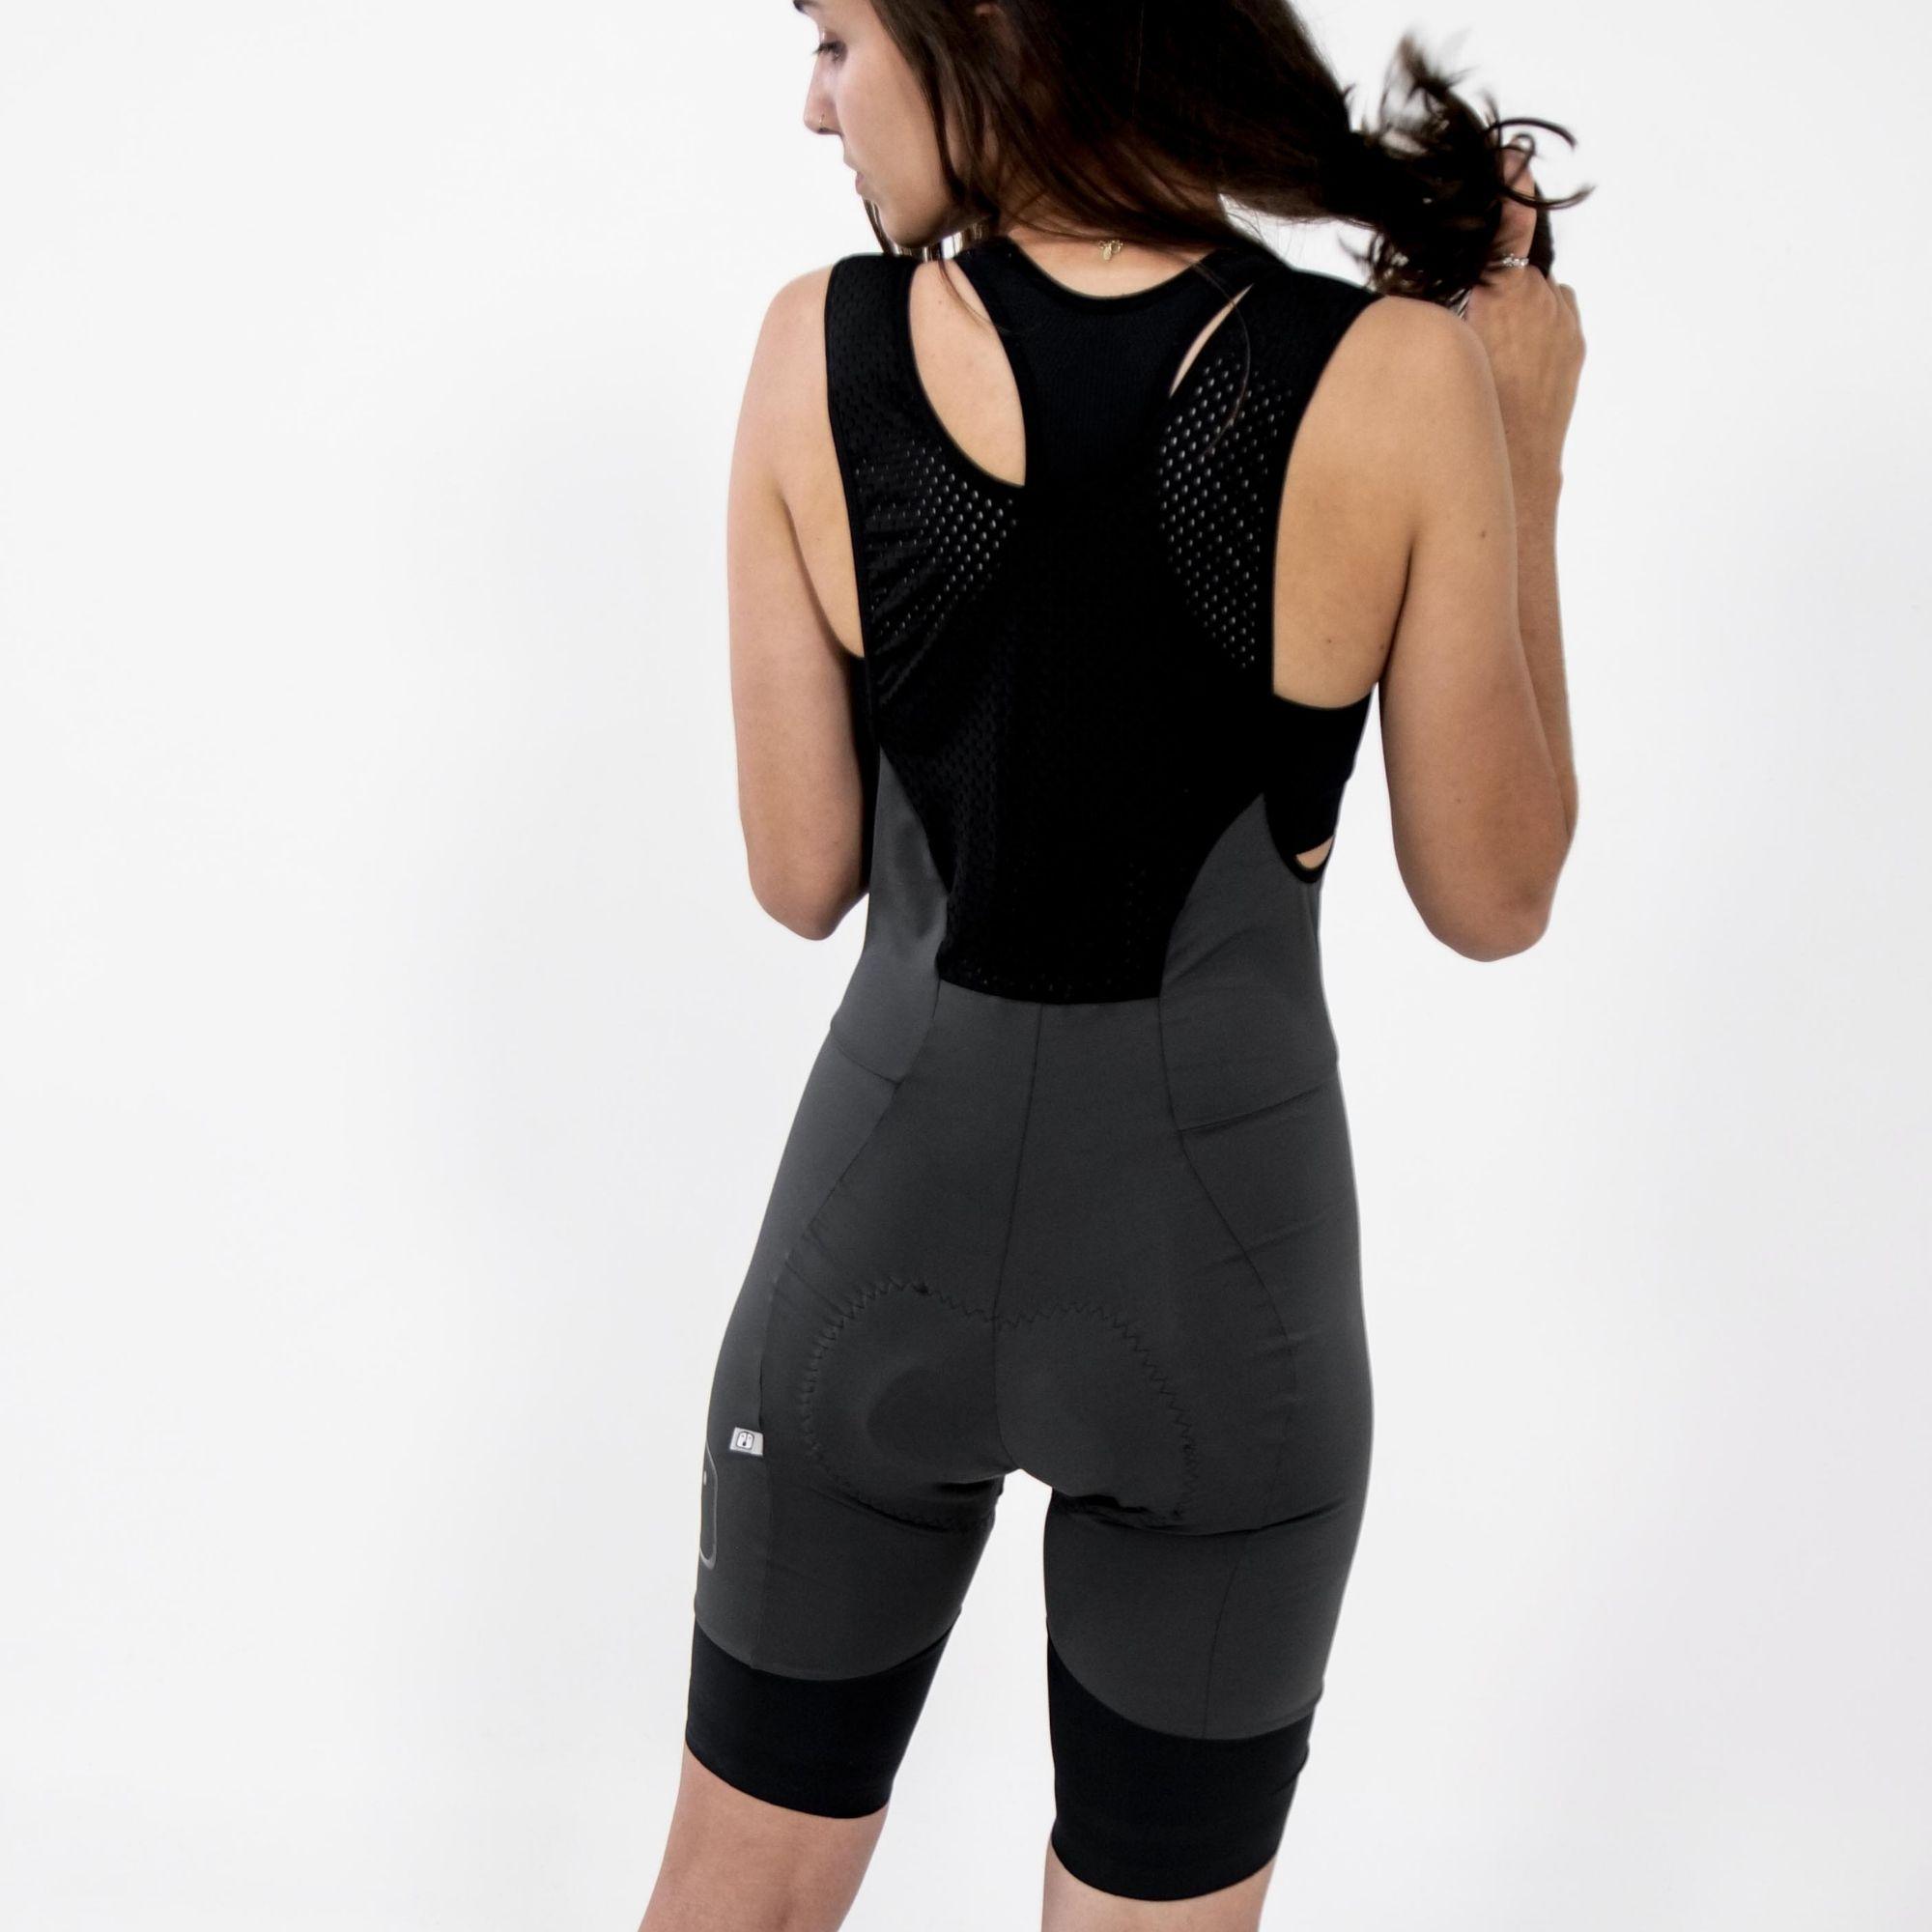 Bretelle Ciclismo Charcoal - Feminino